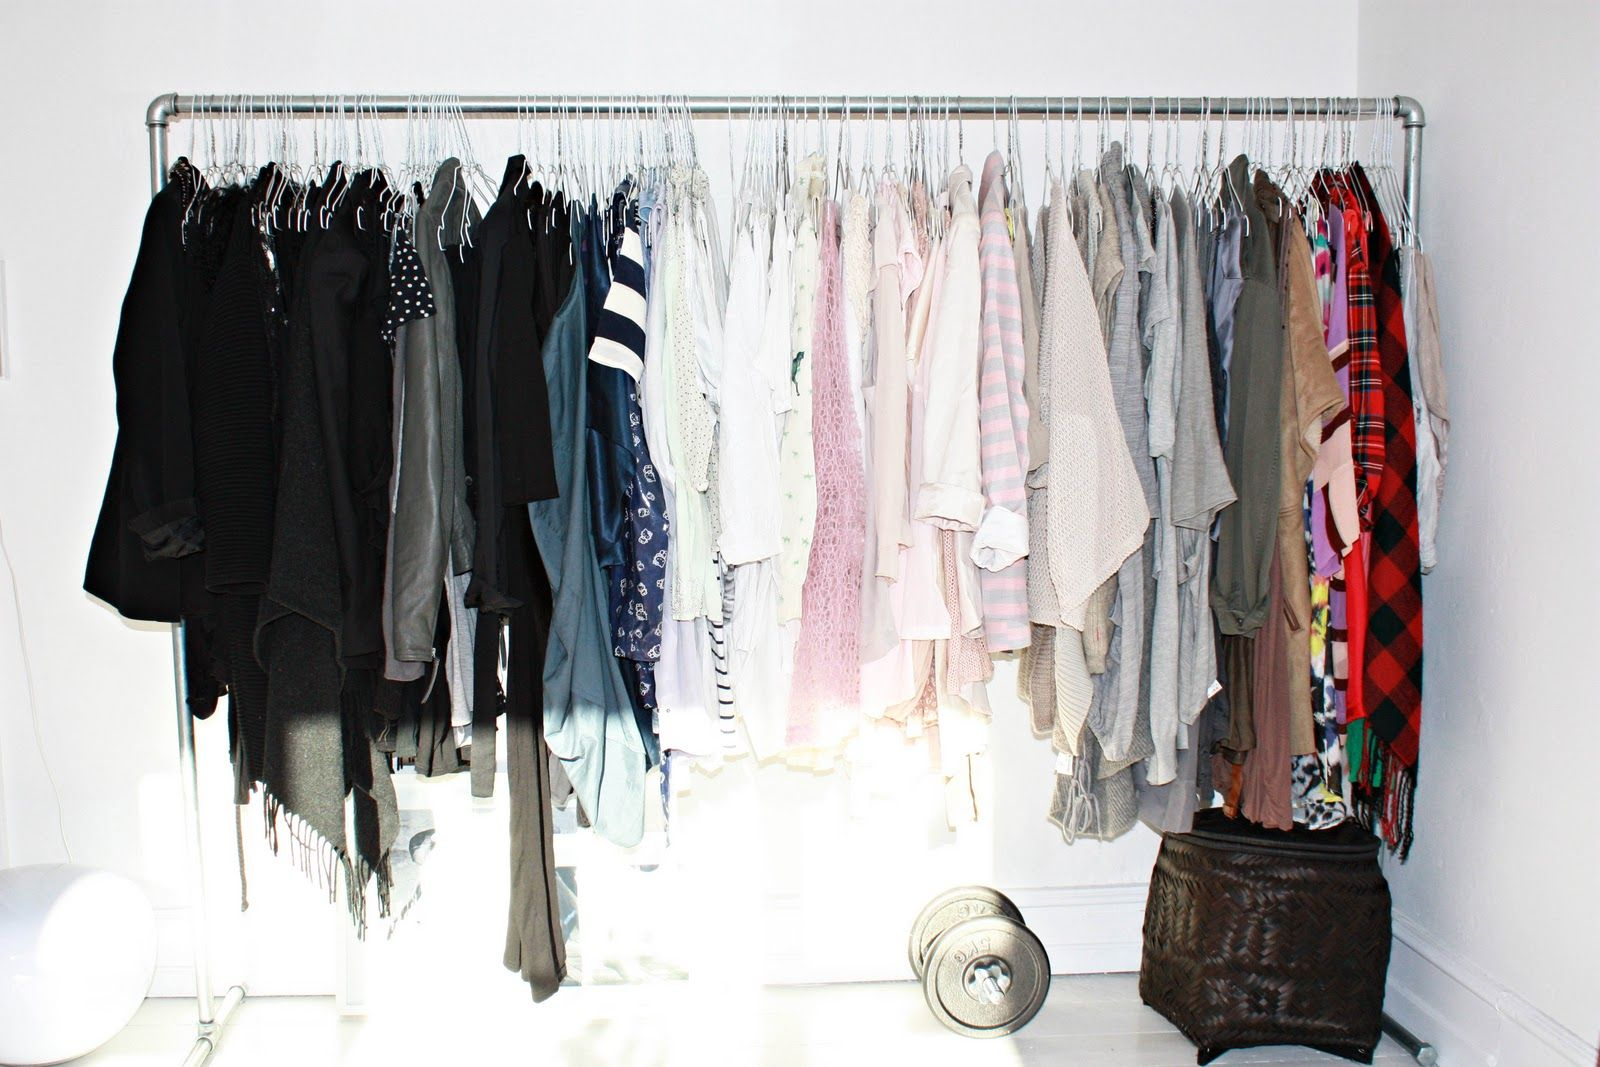 garderobe - Google-søgning